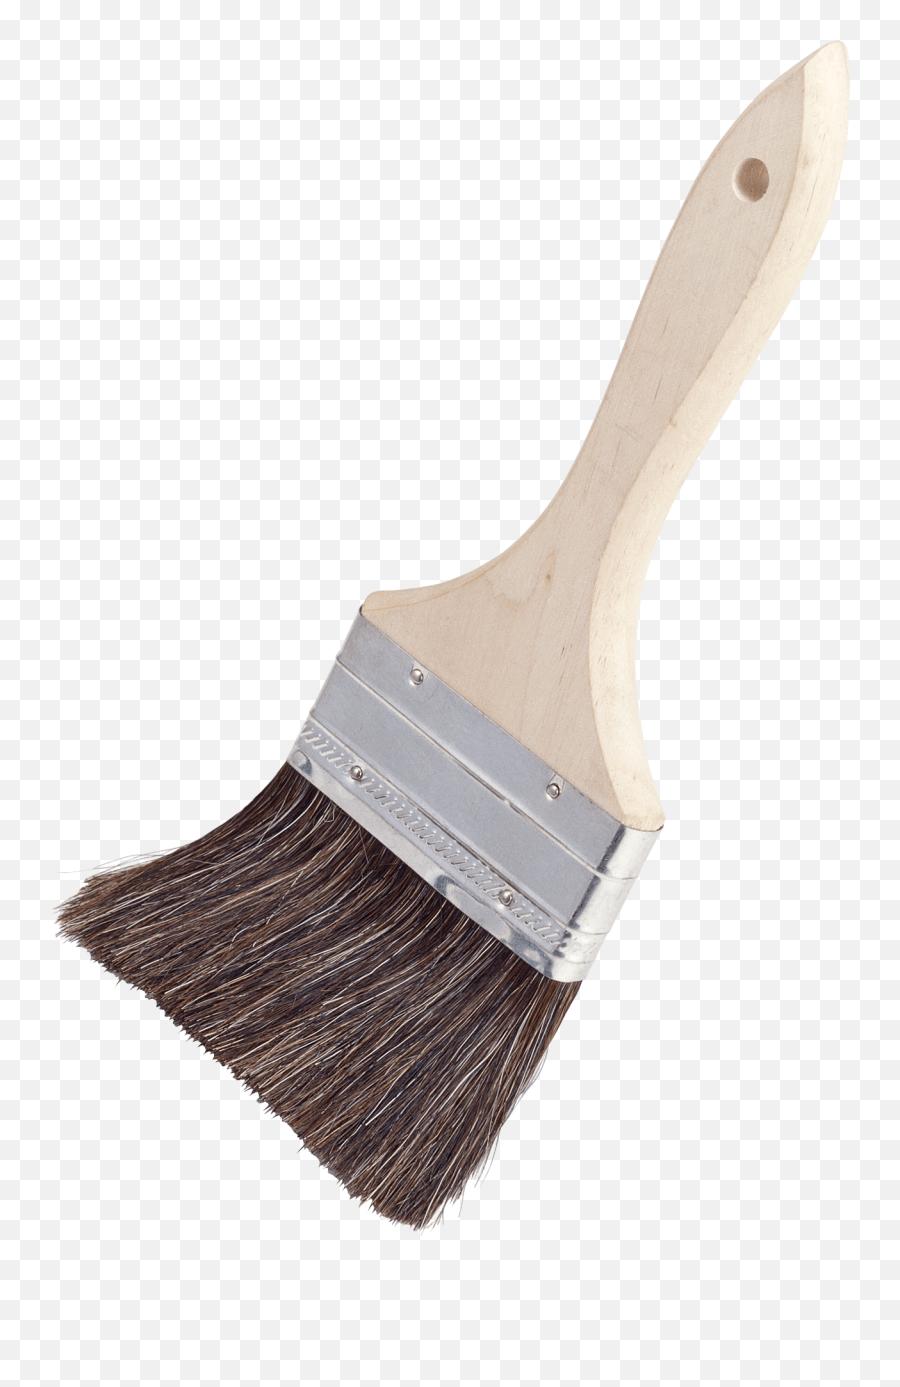 Download Free Paint Brush Png Image - Transparent Background Paint Brush Png Emoji,Broom Emoji For Iphone